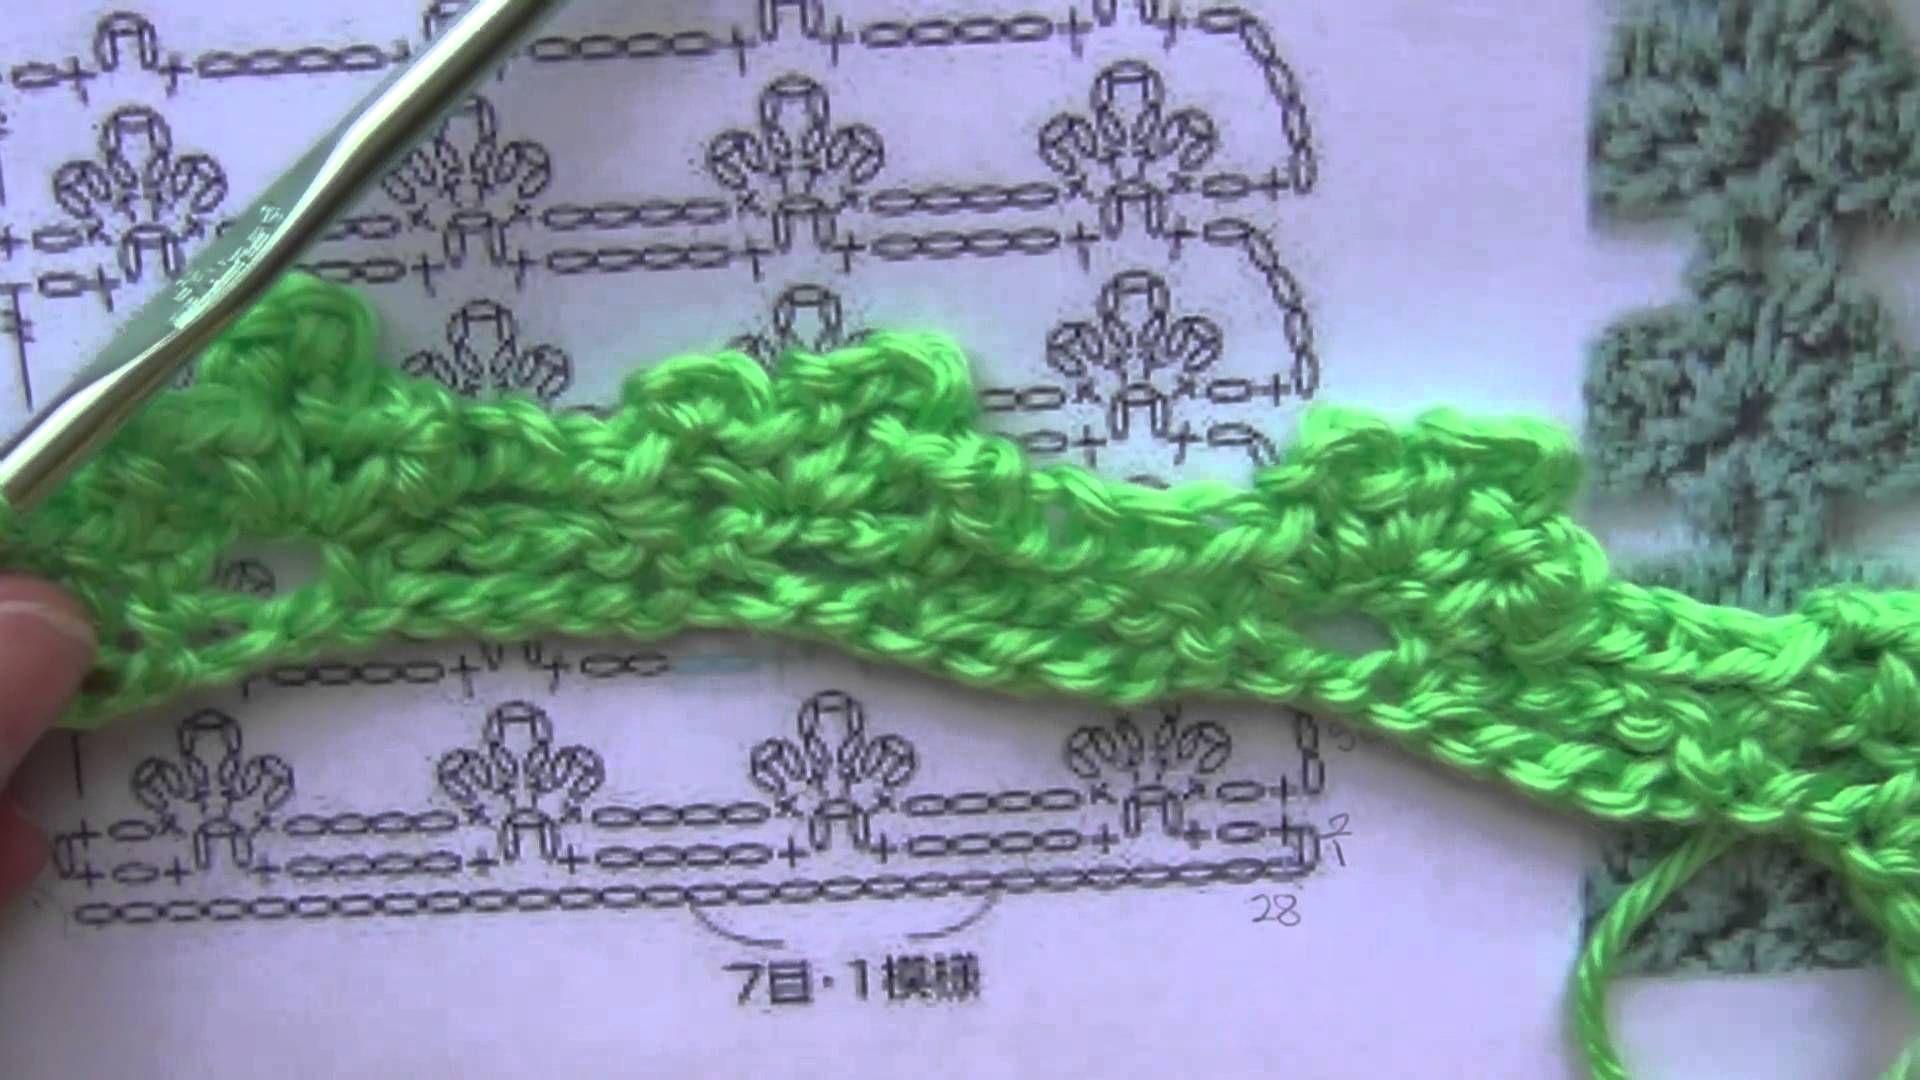 Crochet a lacy stitch using a pattern with symbols